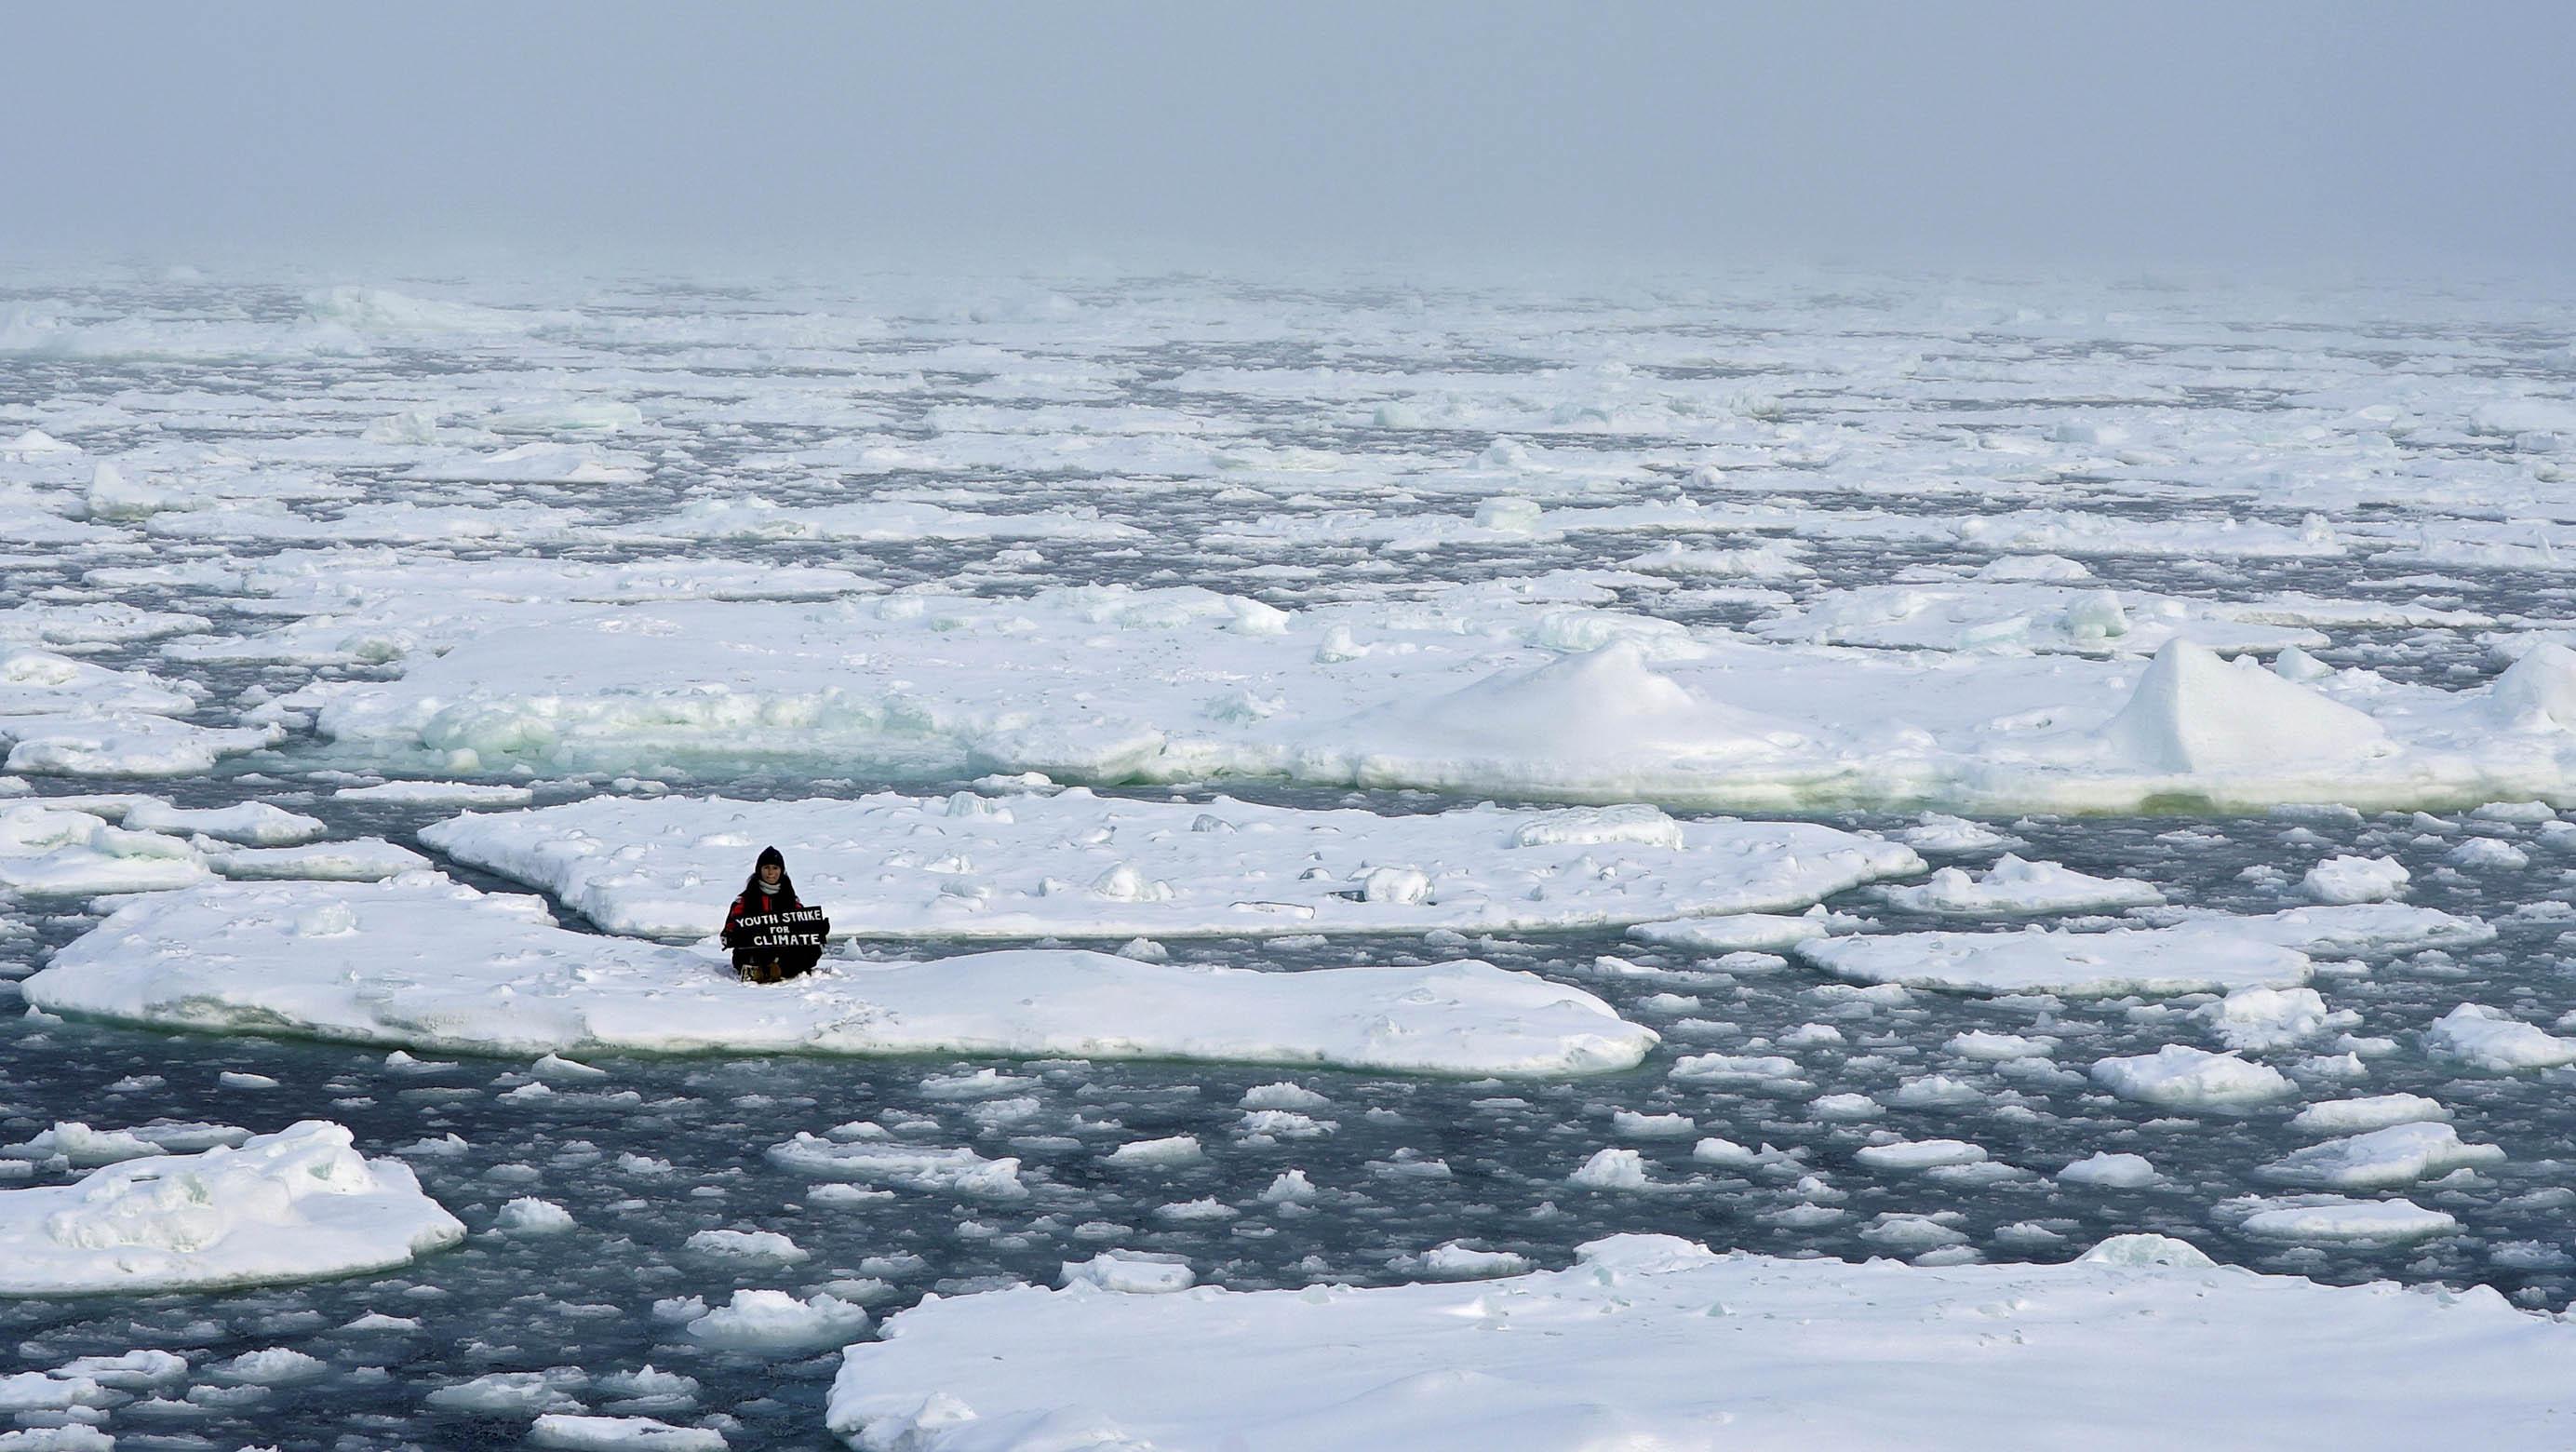 IPCC最新报告指出,在最乐观情况下,2050年前夏季末的北冰洋海冰将完全消失。(路透社)